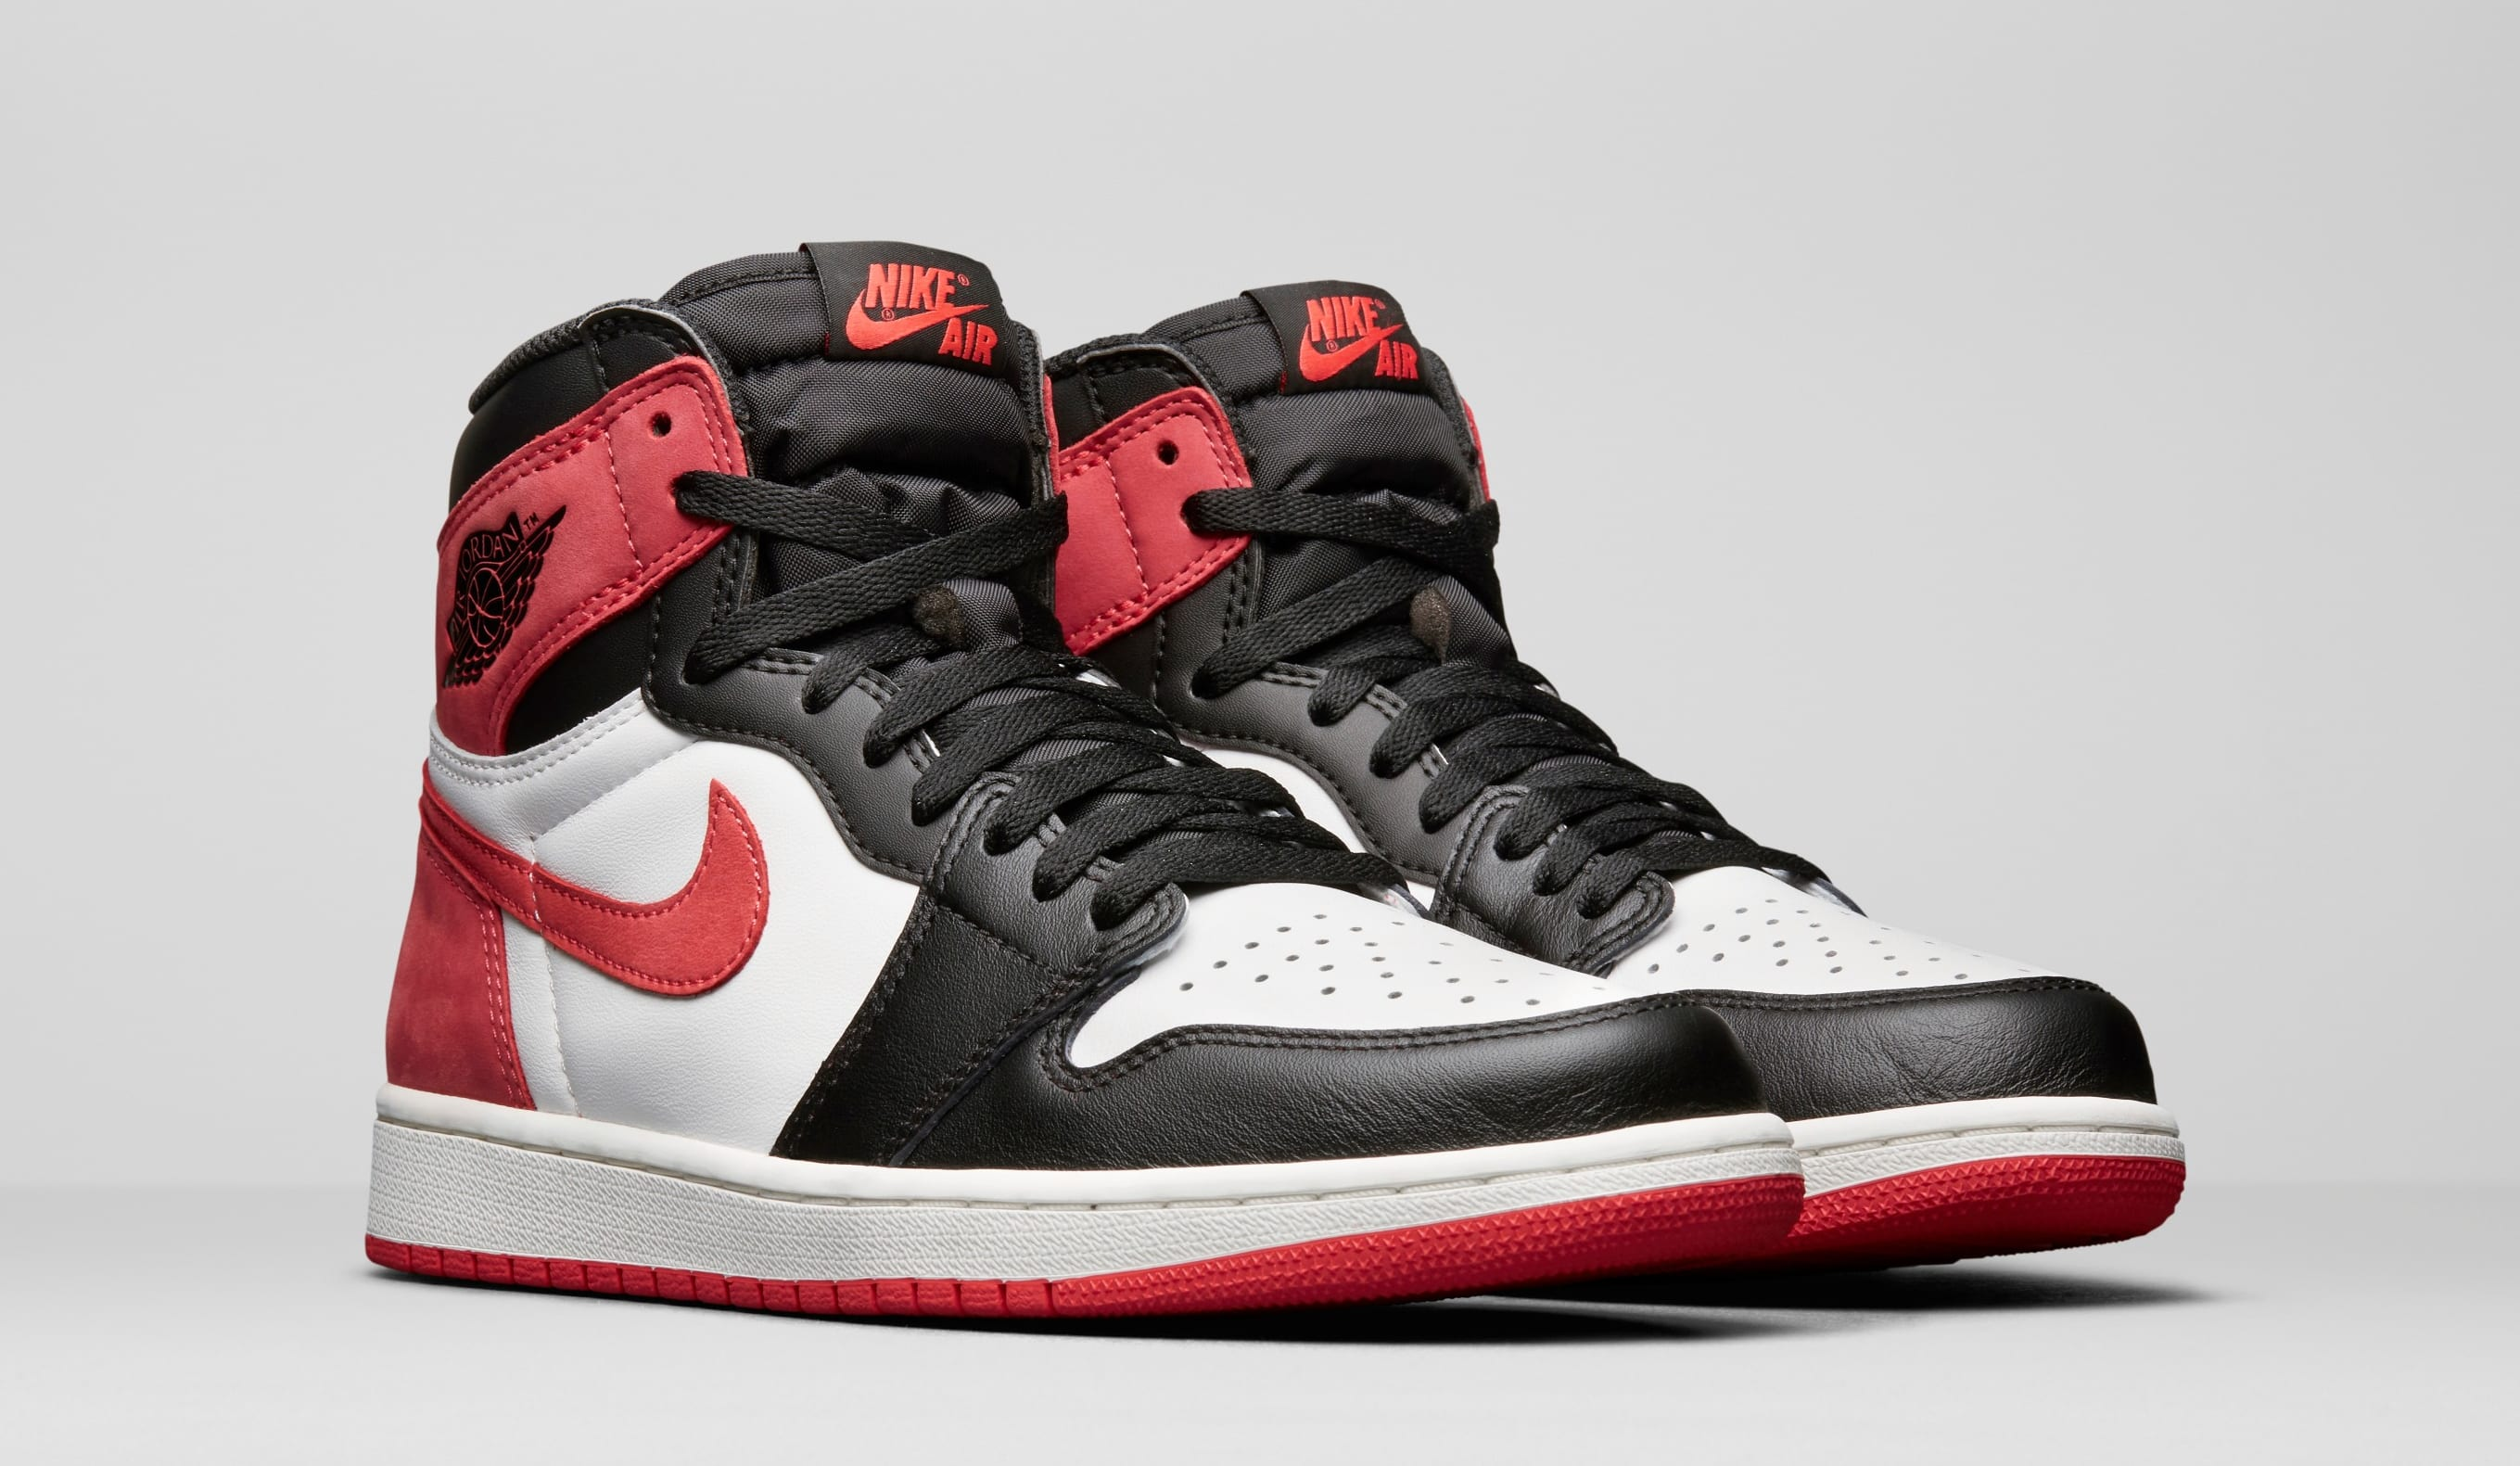 Air Jordan 1 High OG 'Track Red' 555088-112